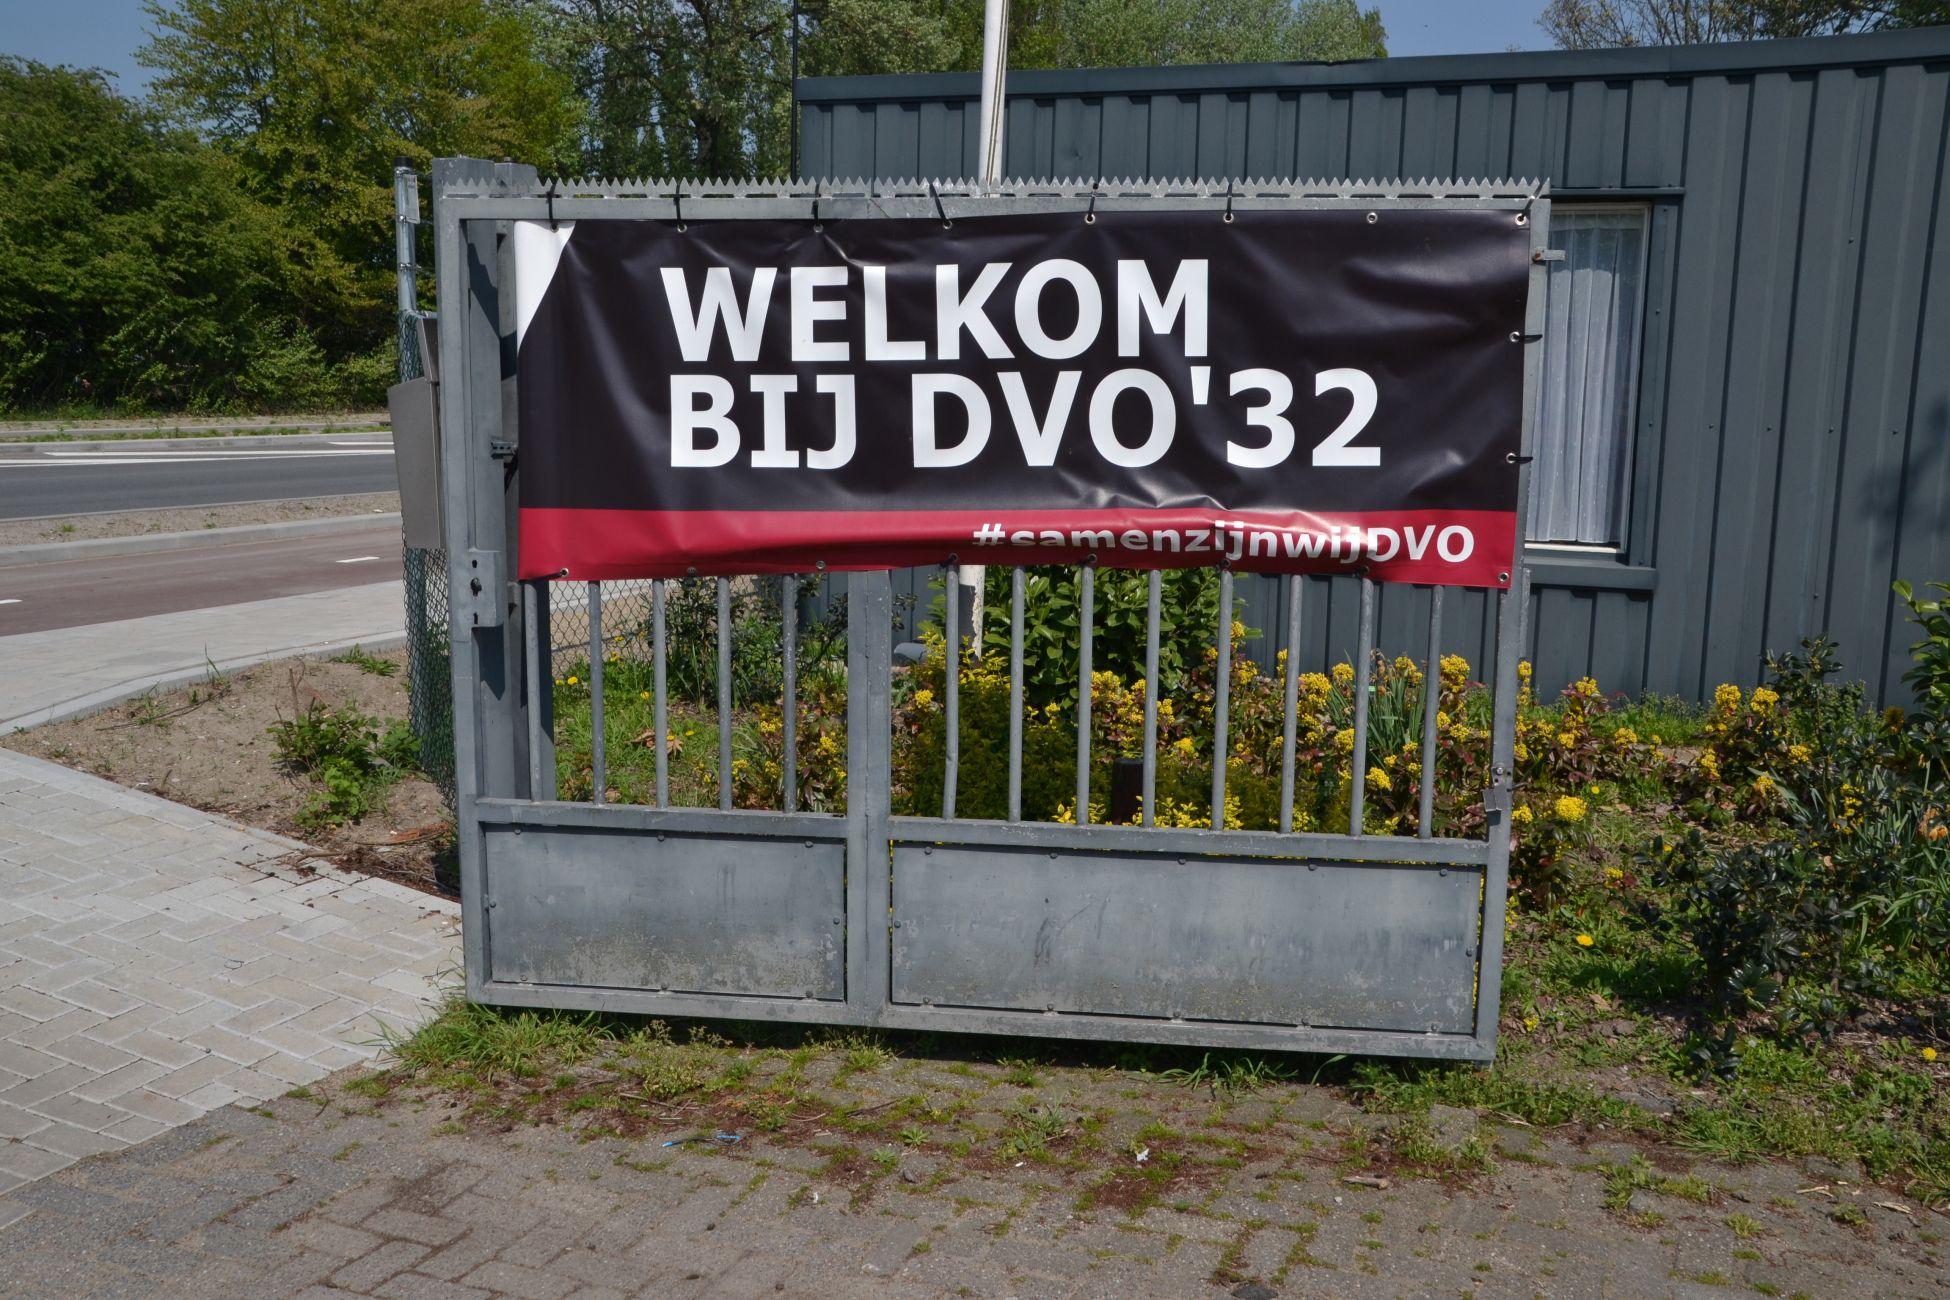 Ruime oefenzege DVO'32 op Maasdijk